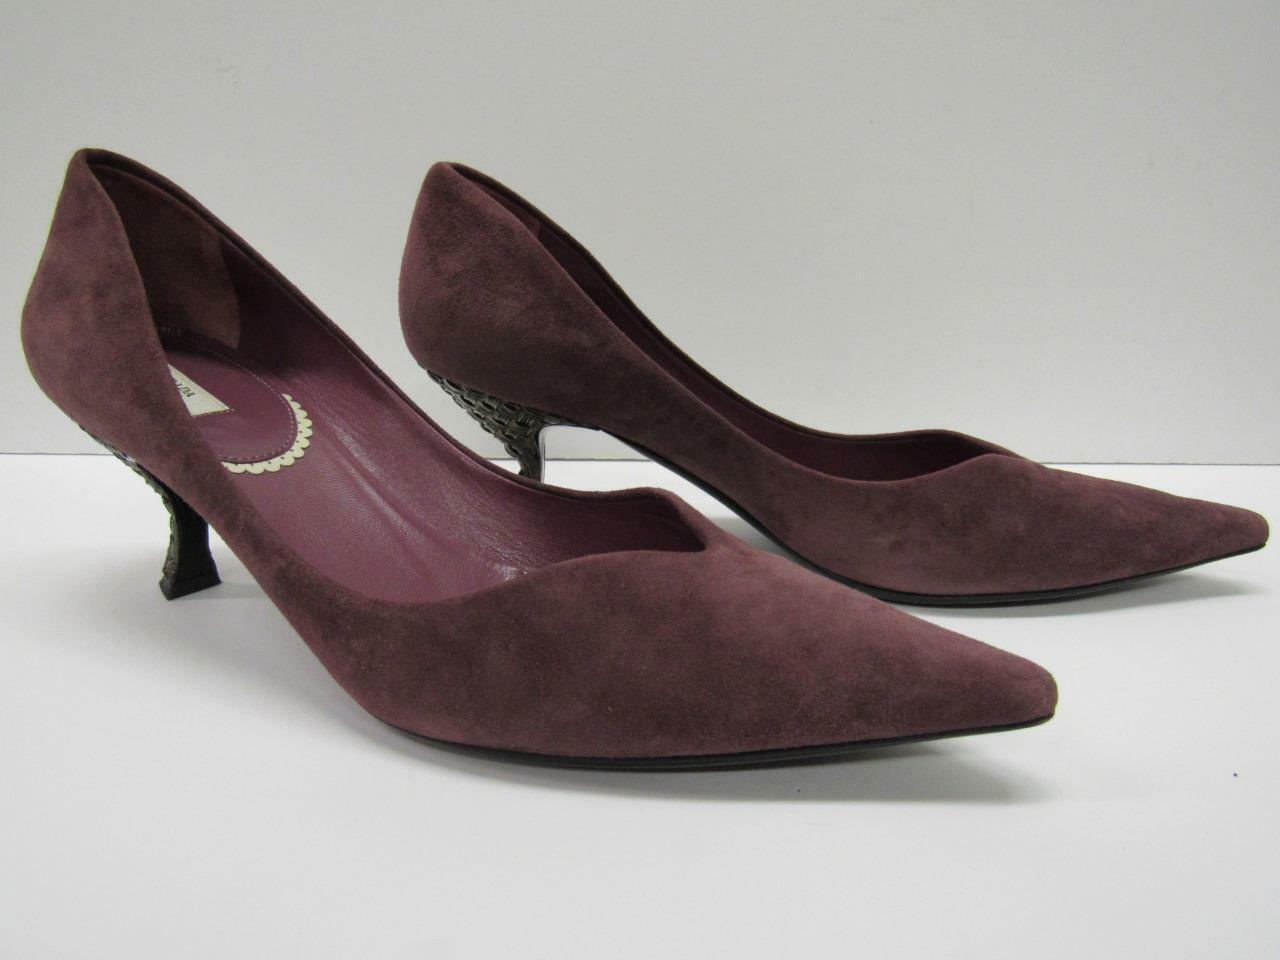 Prada Scalloped Suede Pump Metallic Heels shoes Mauve Womens 7.5 Euro 37.5